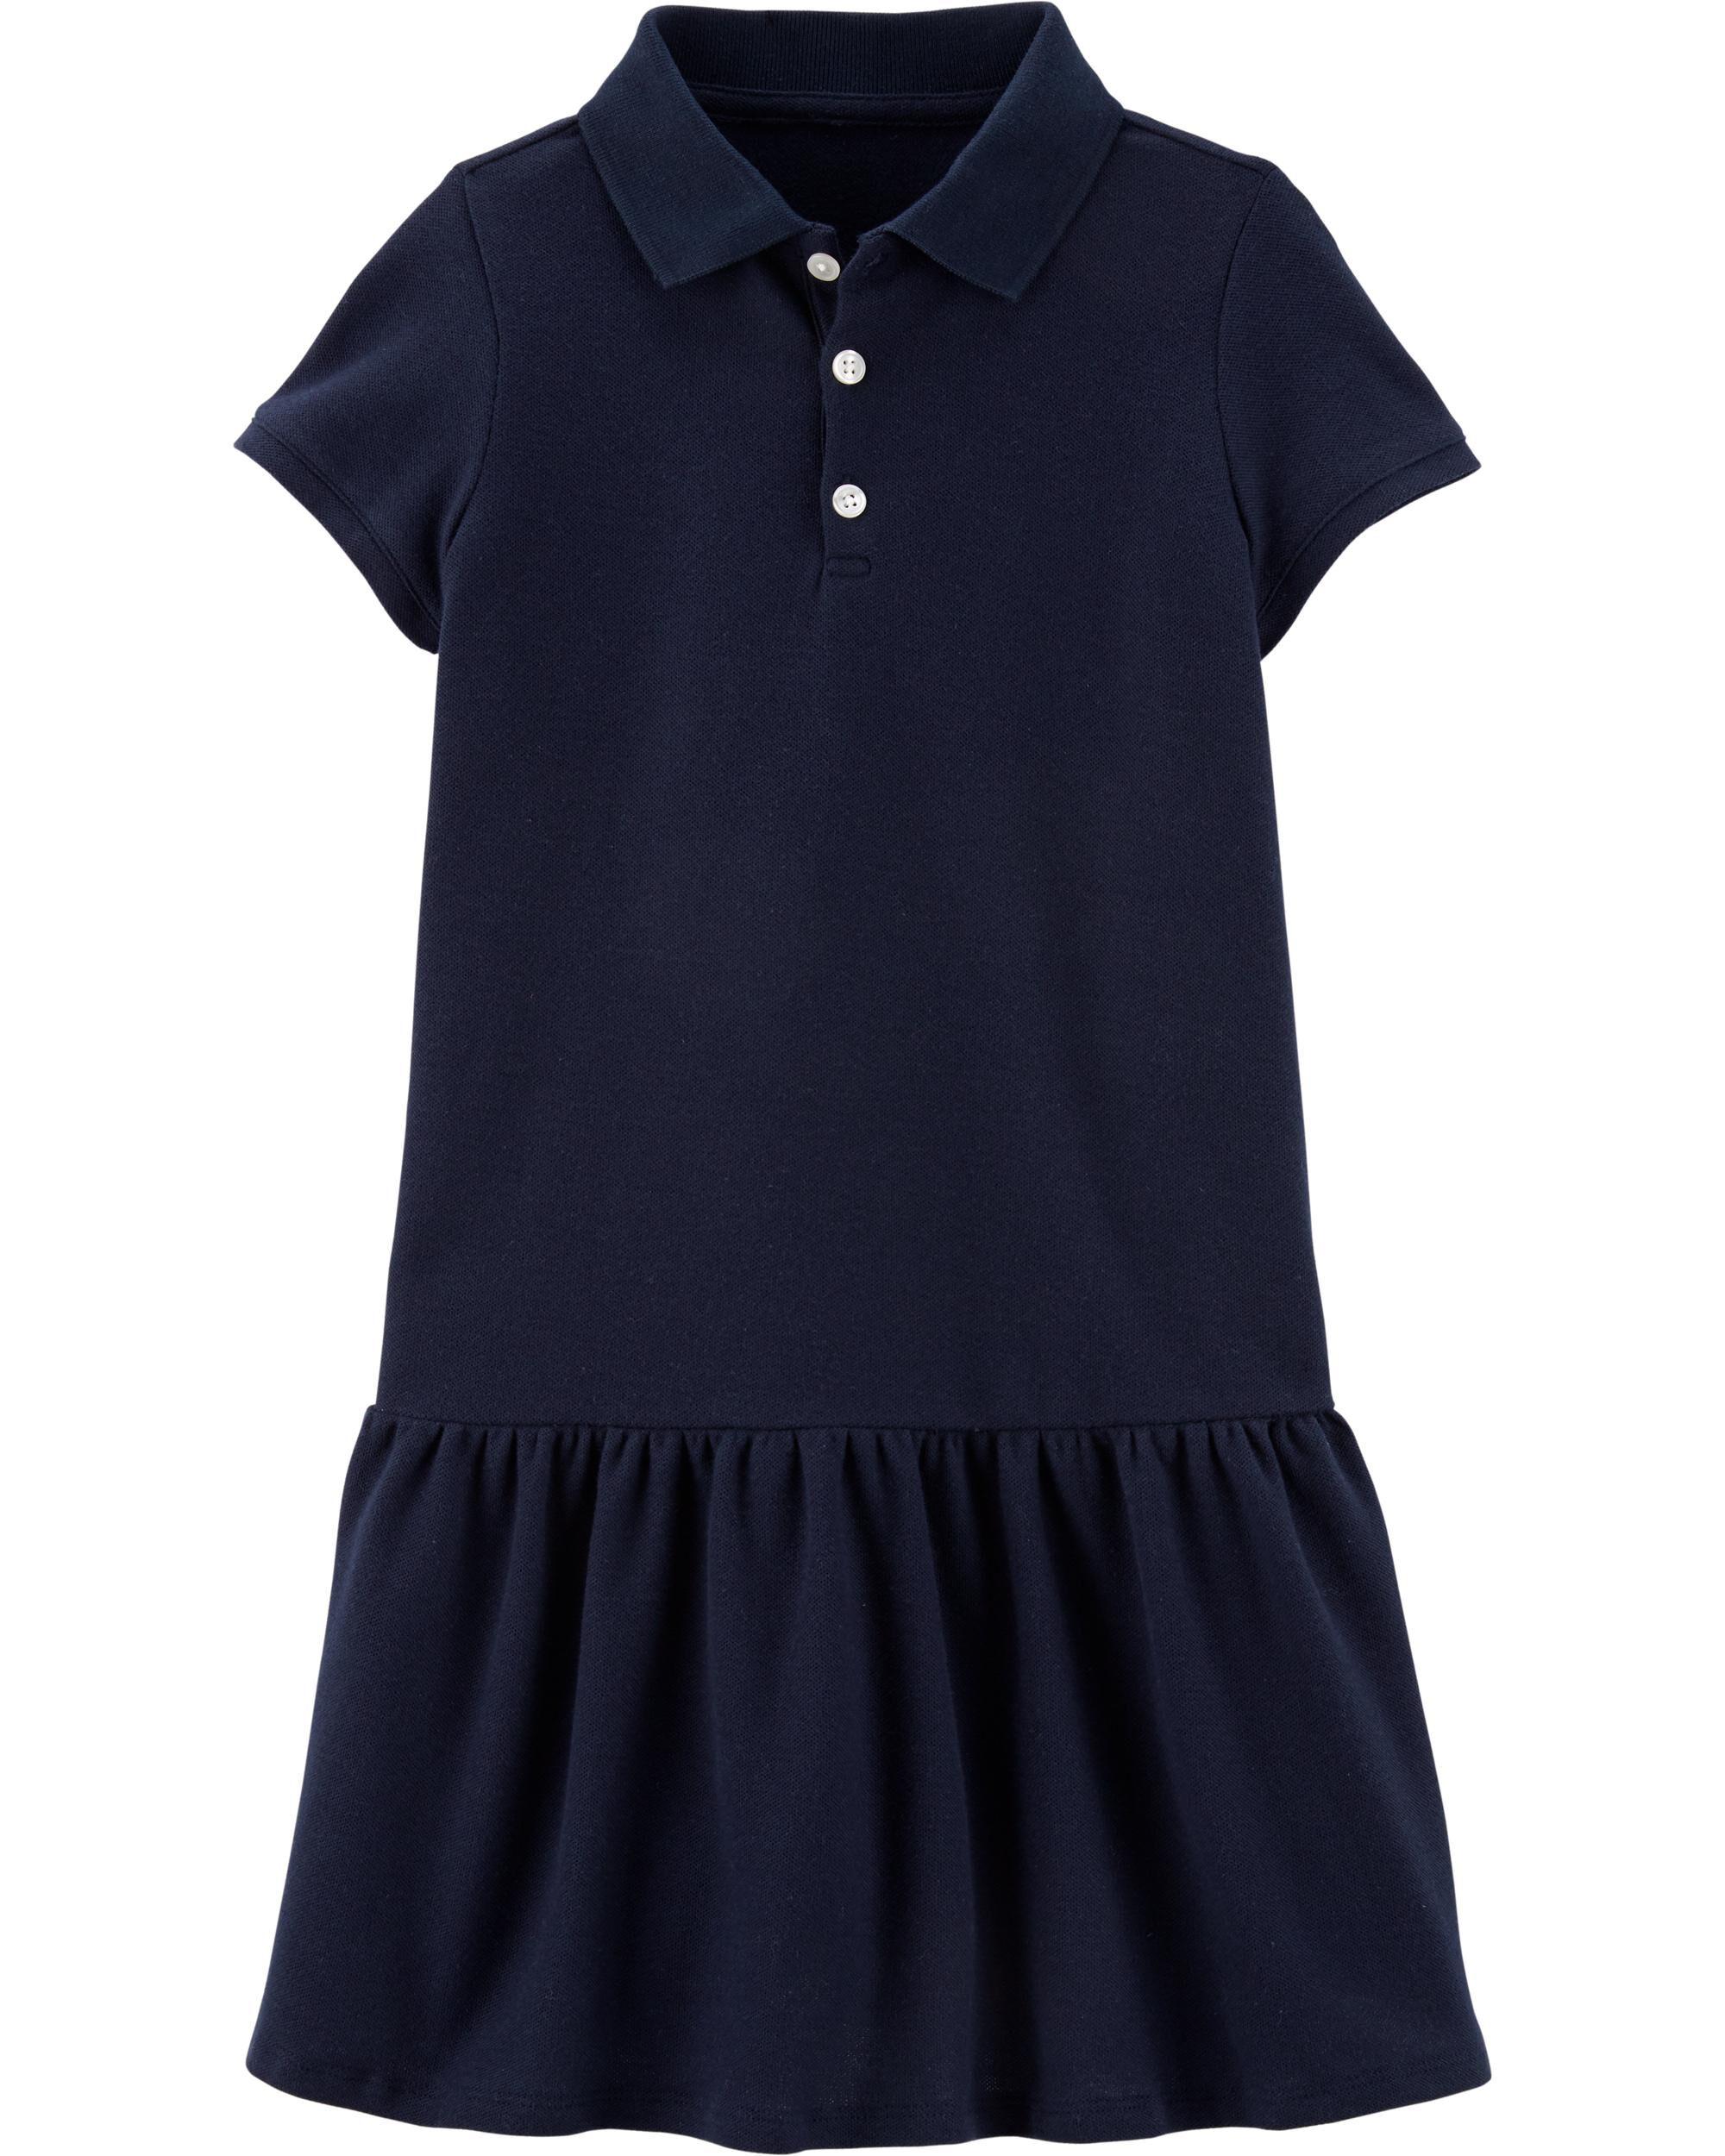 *DOORBUSTER*Piqué Polo Uniform Dress